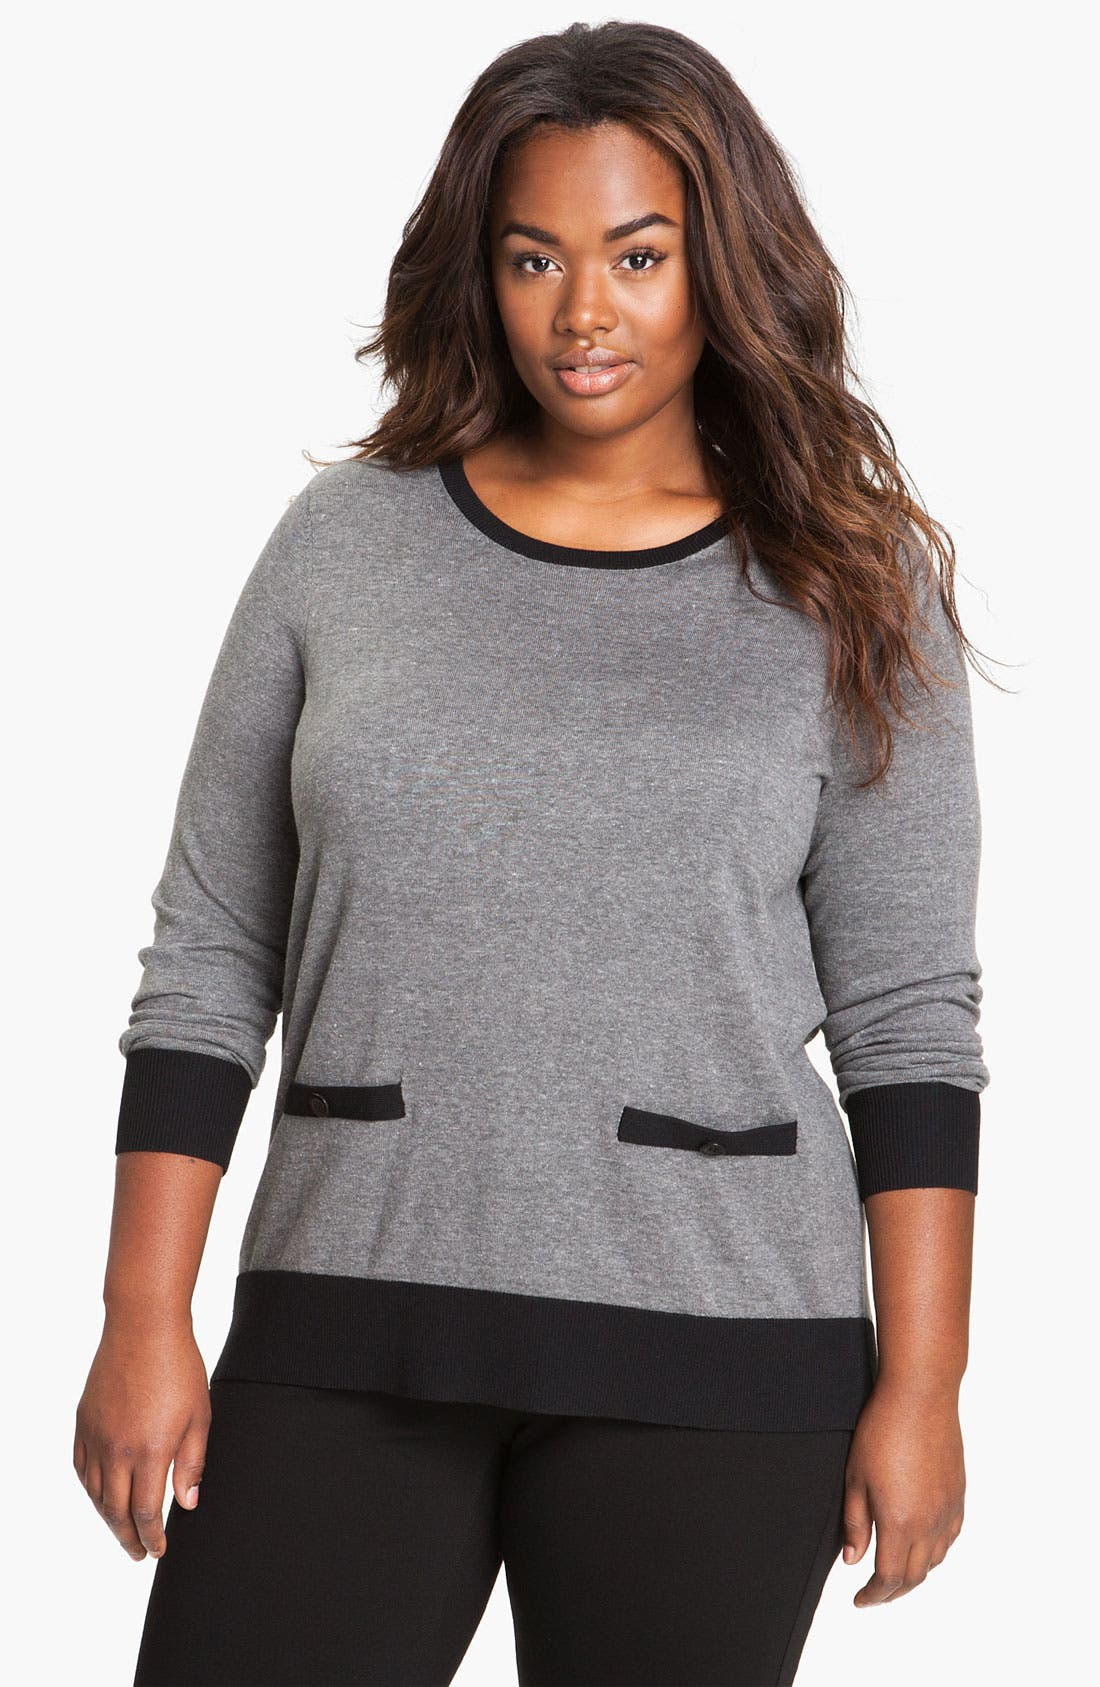 Alternate Image 1 Selected - Sejour Contrast Trim Sweater (Plus)